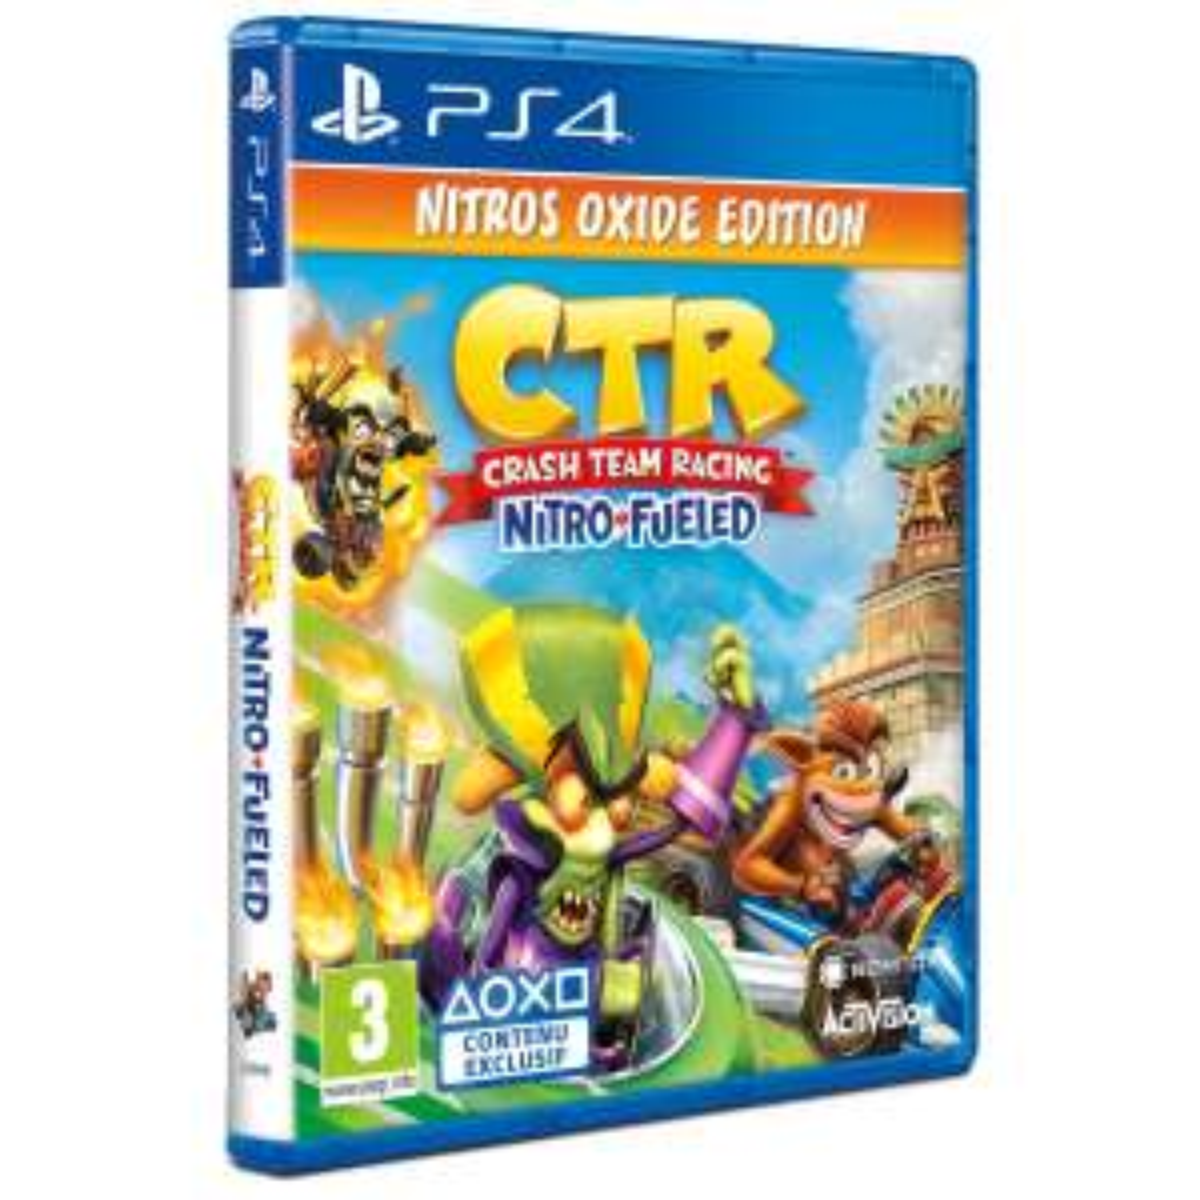 [Précommande] Jeu Crash Team Racing Nitro-Fueled - Edition Nitros Oxide sur PS4